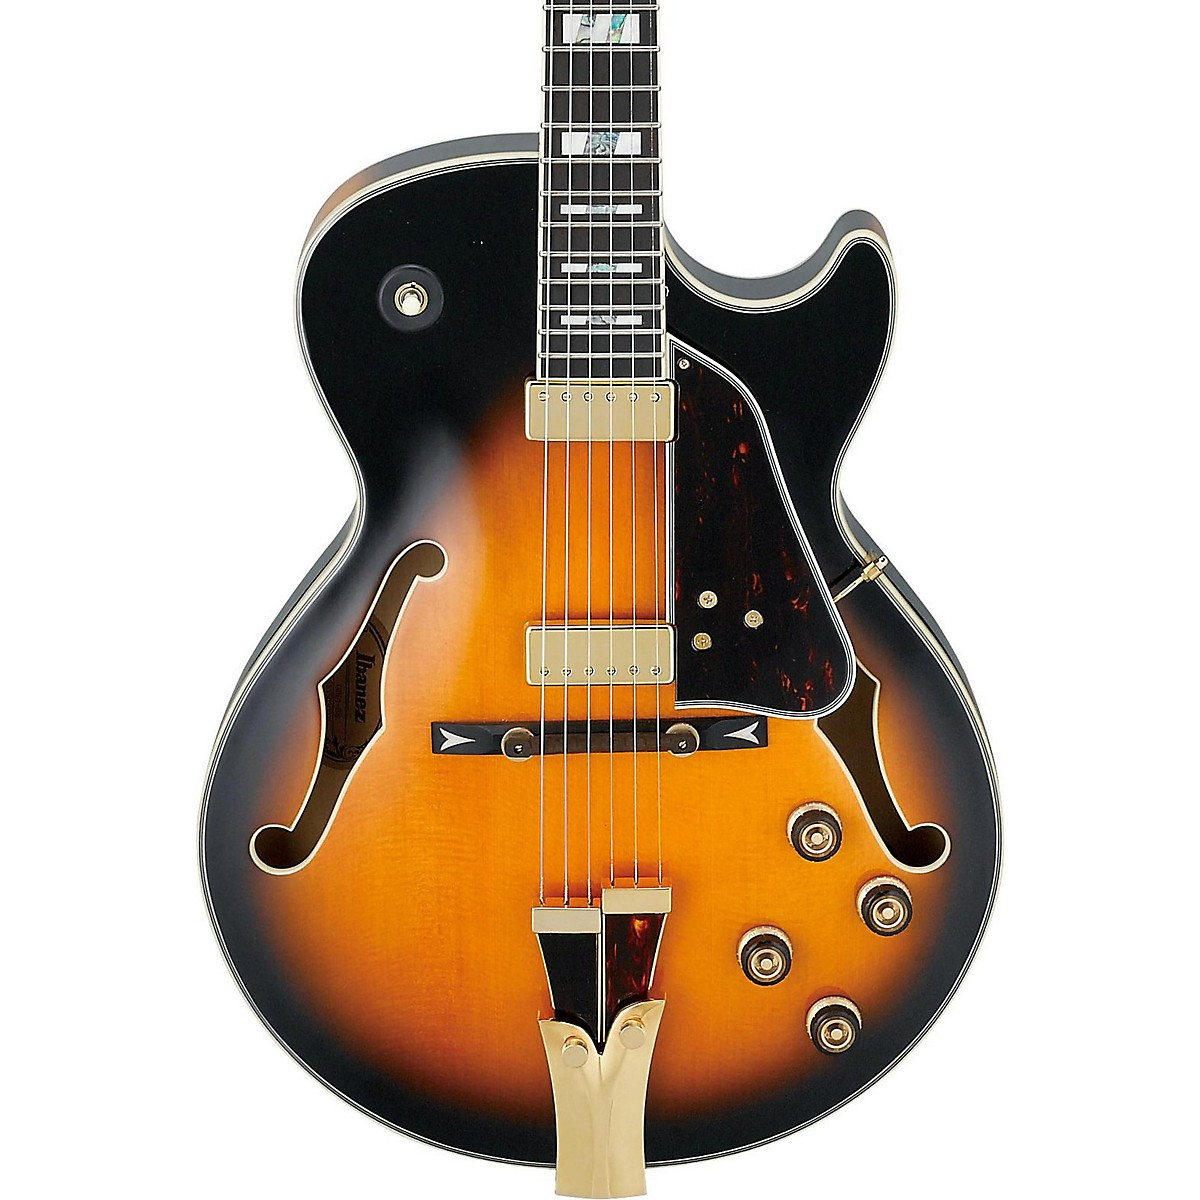 Ibanez GB Series GB10SE George Benson Signature Hollow Body Electric Guitar